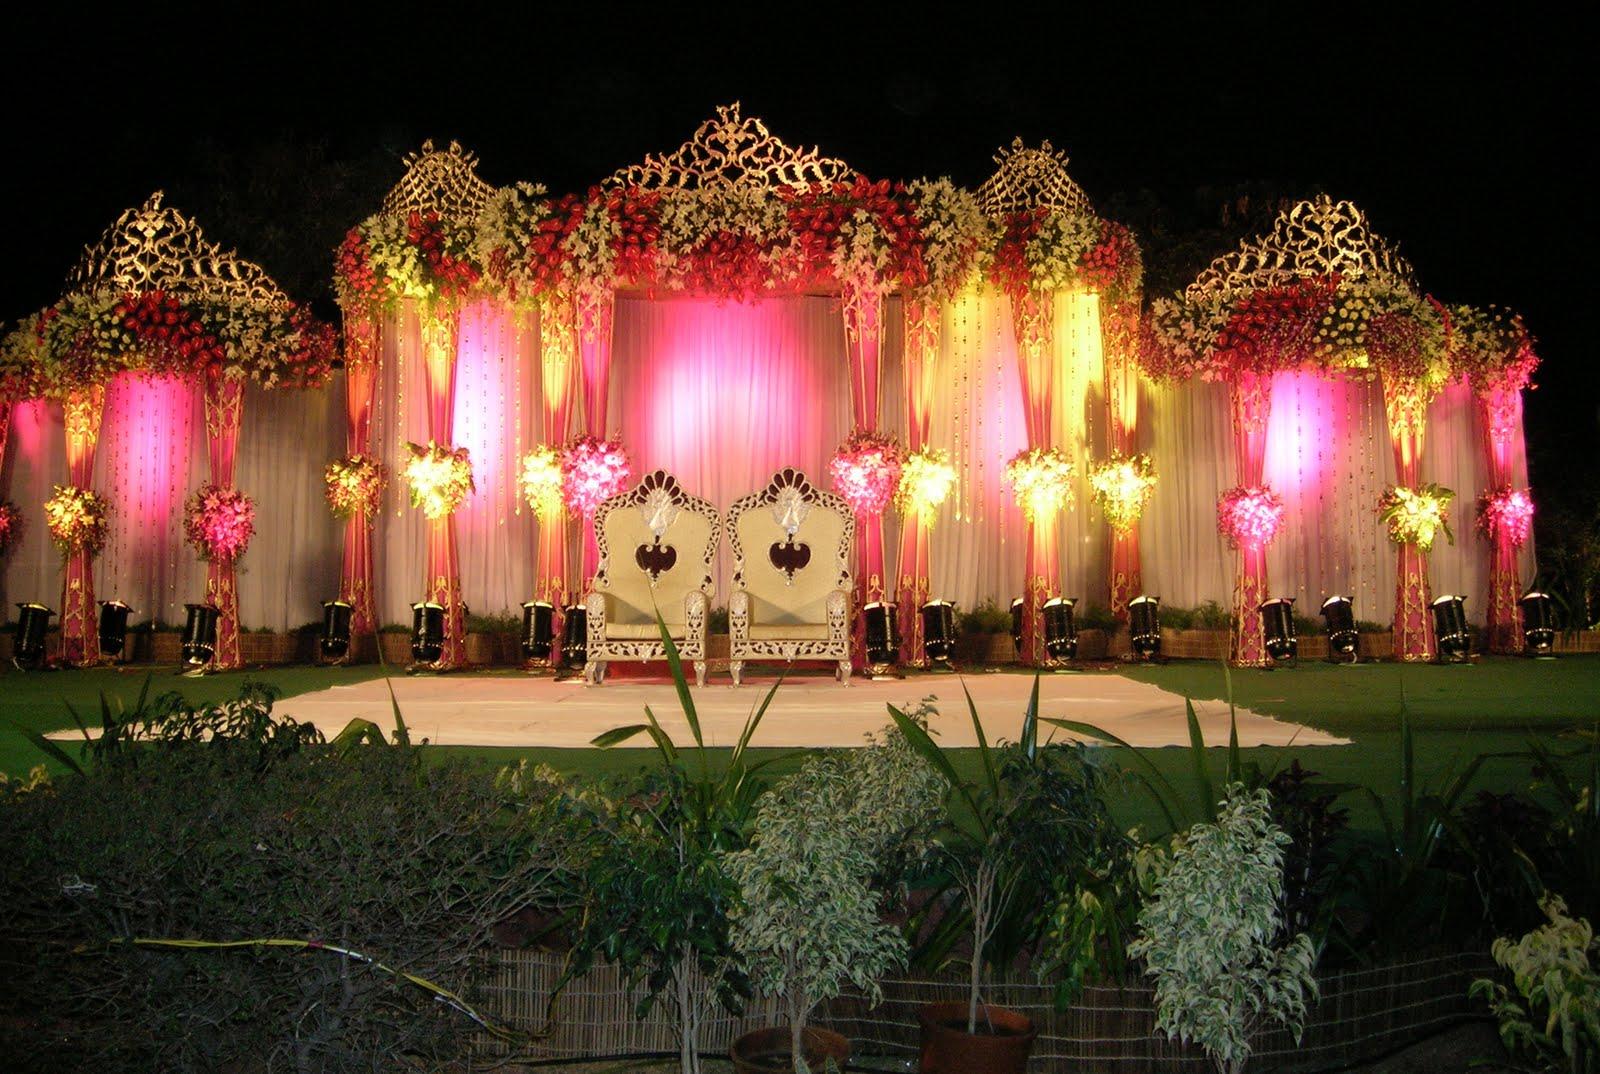 M92B252842529 - Unique Wedding stage Decoration